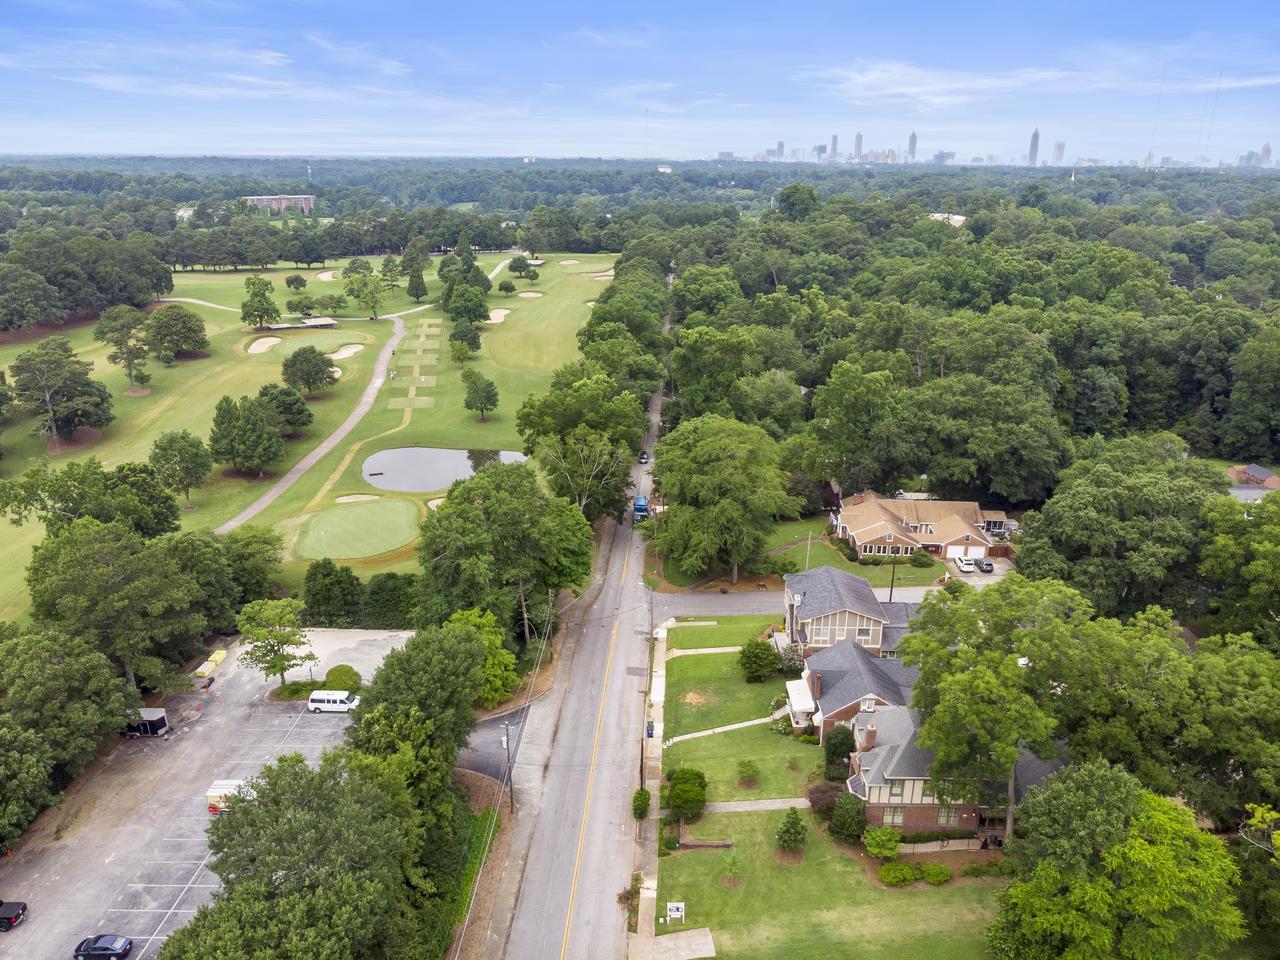 2516 Alston Dr SE Atlanta GA-005-010-GLM00010010-MLS_Size.jpg